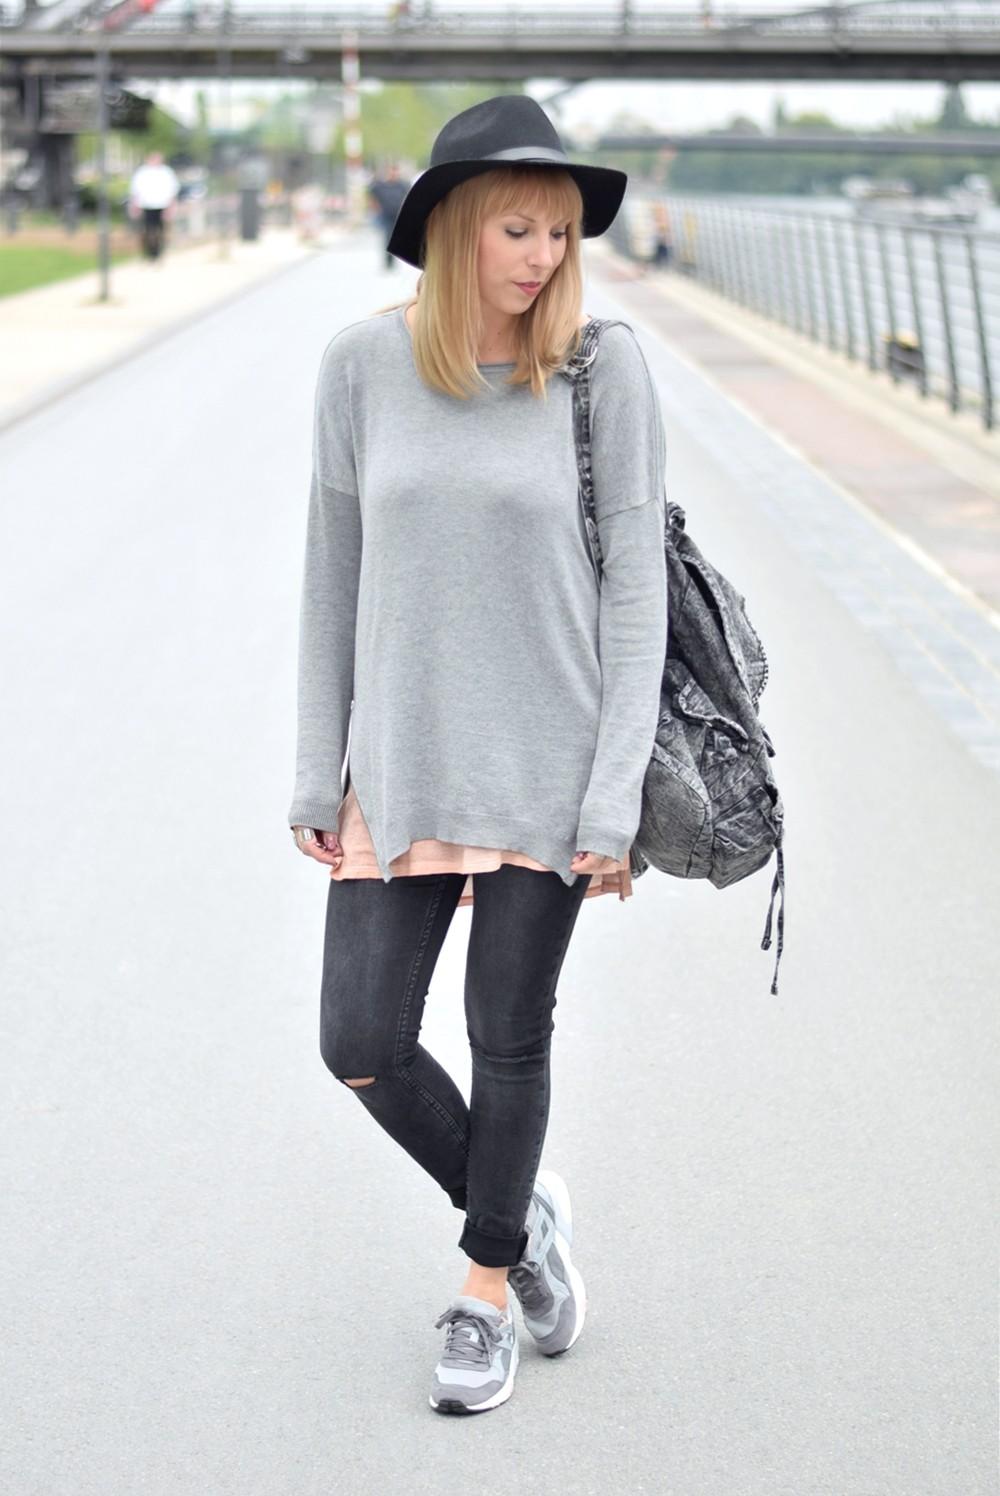 Puma Vashtie Outfit grau Jeans Sweater 11